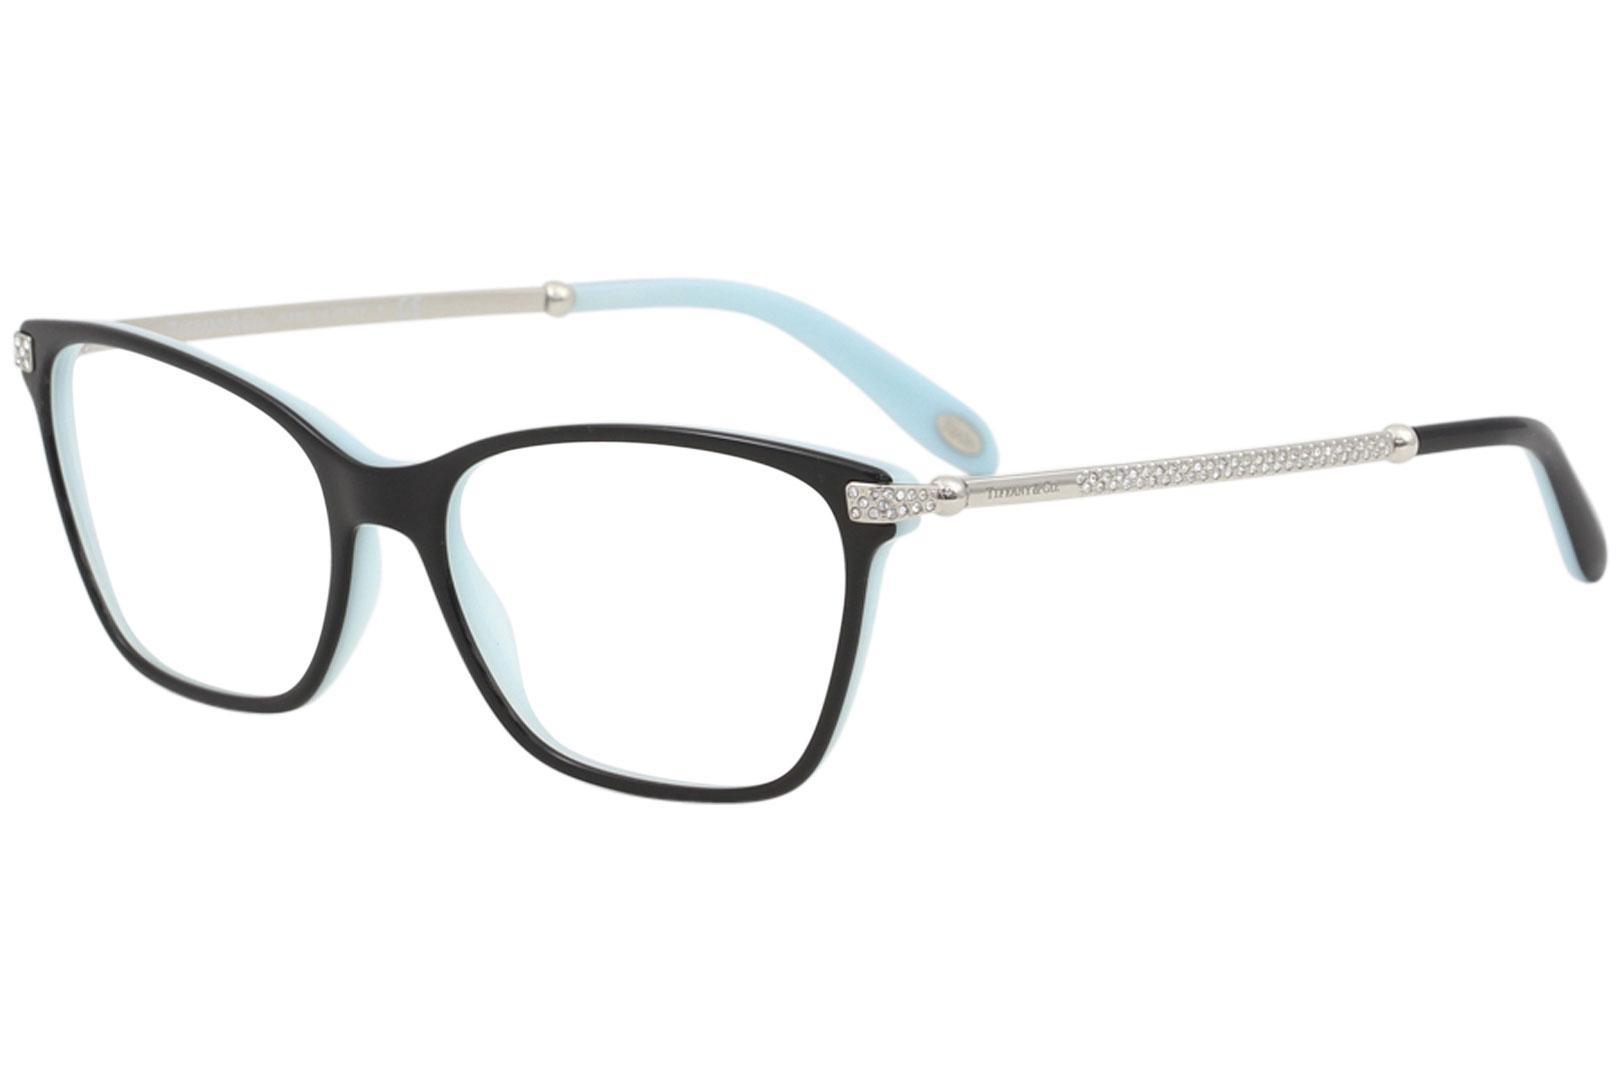 Tiffany Co Women S Eyeglasses Tf2158b Tf 2158 B Full Rim Optical Frame